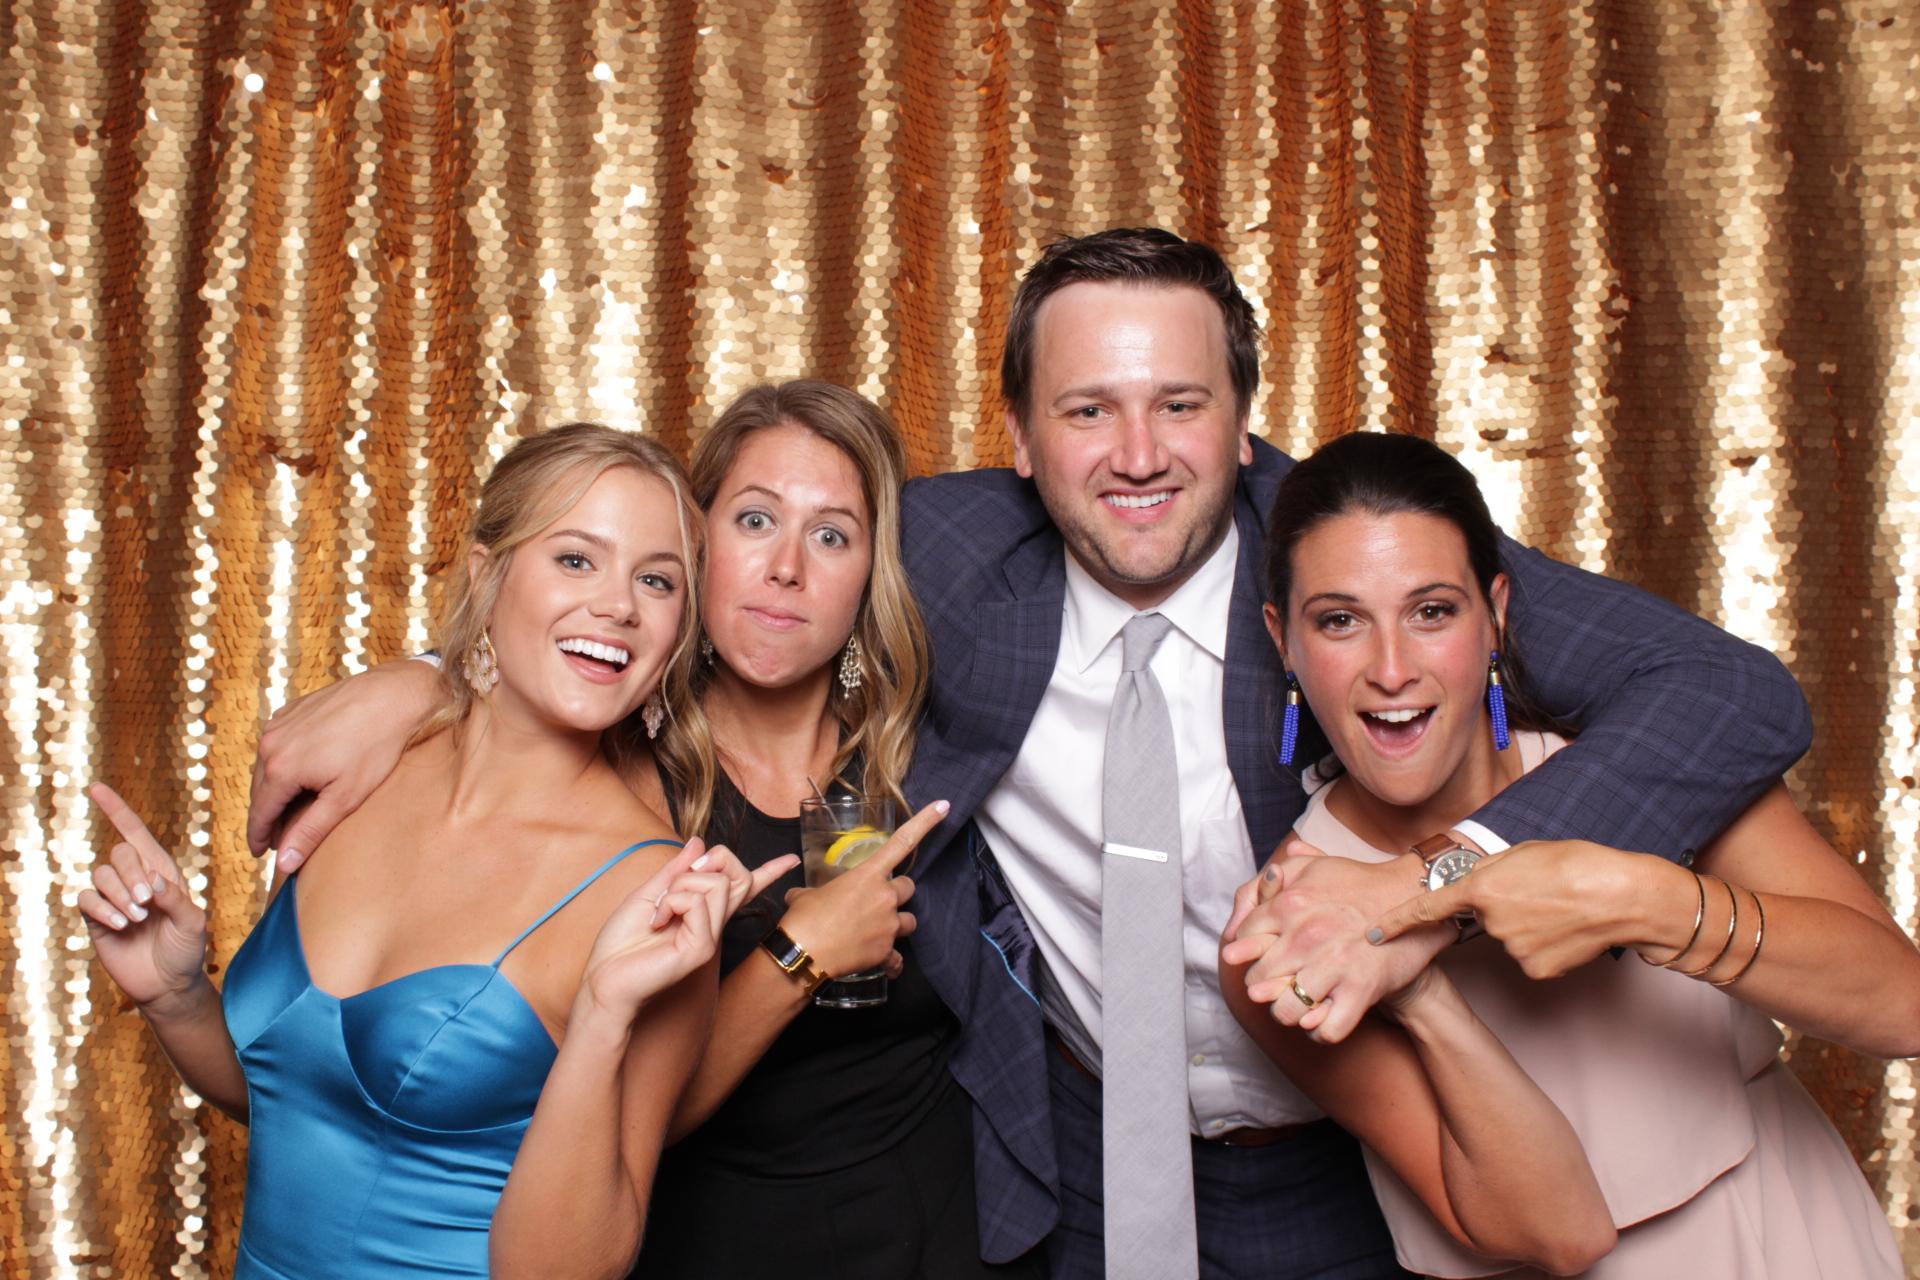 Minneapolis_wedding_photo_booth_Machine_Shop (2).jpg